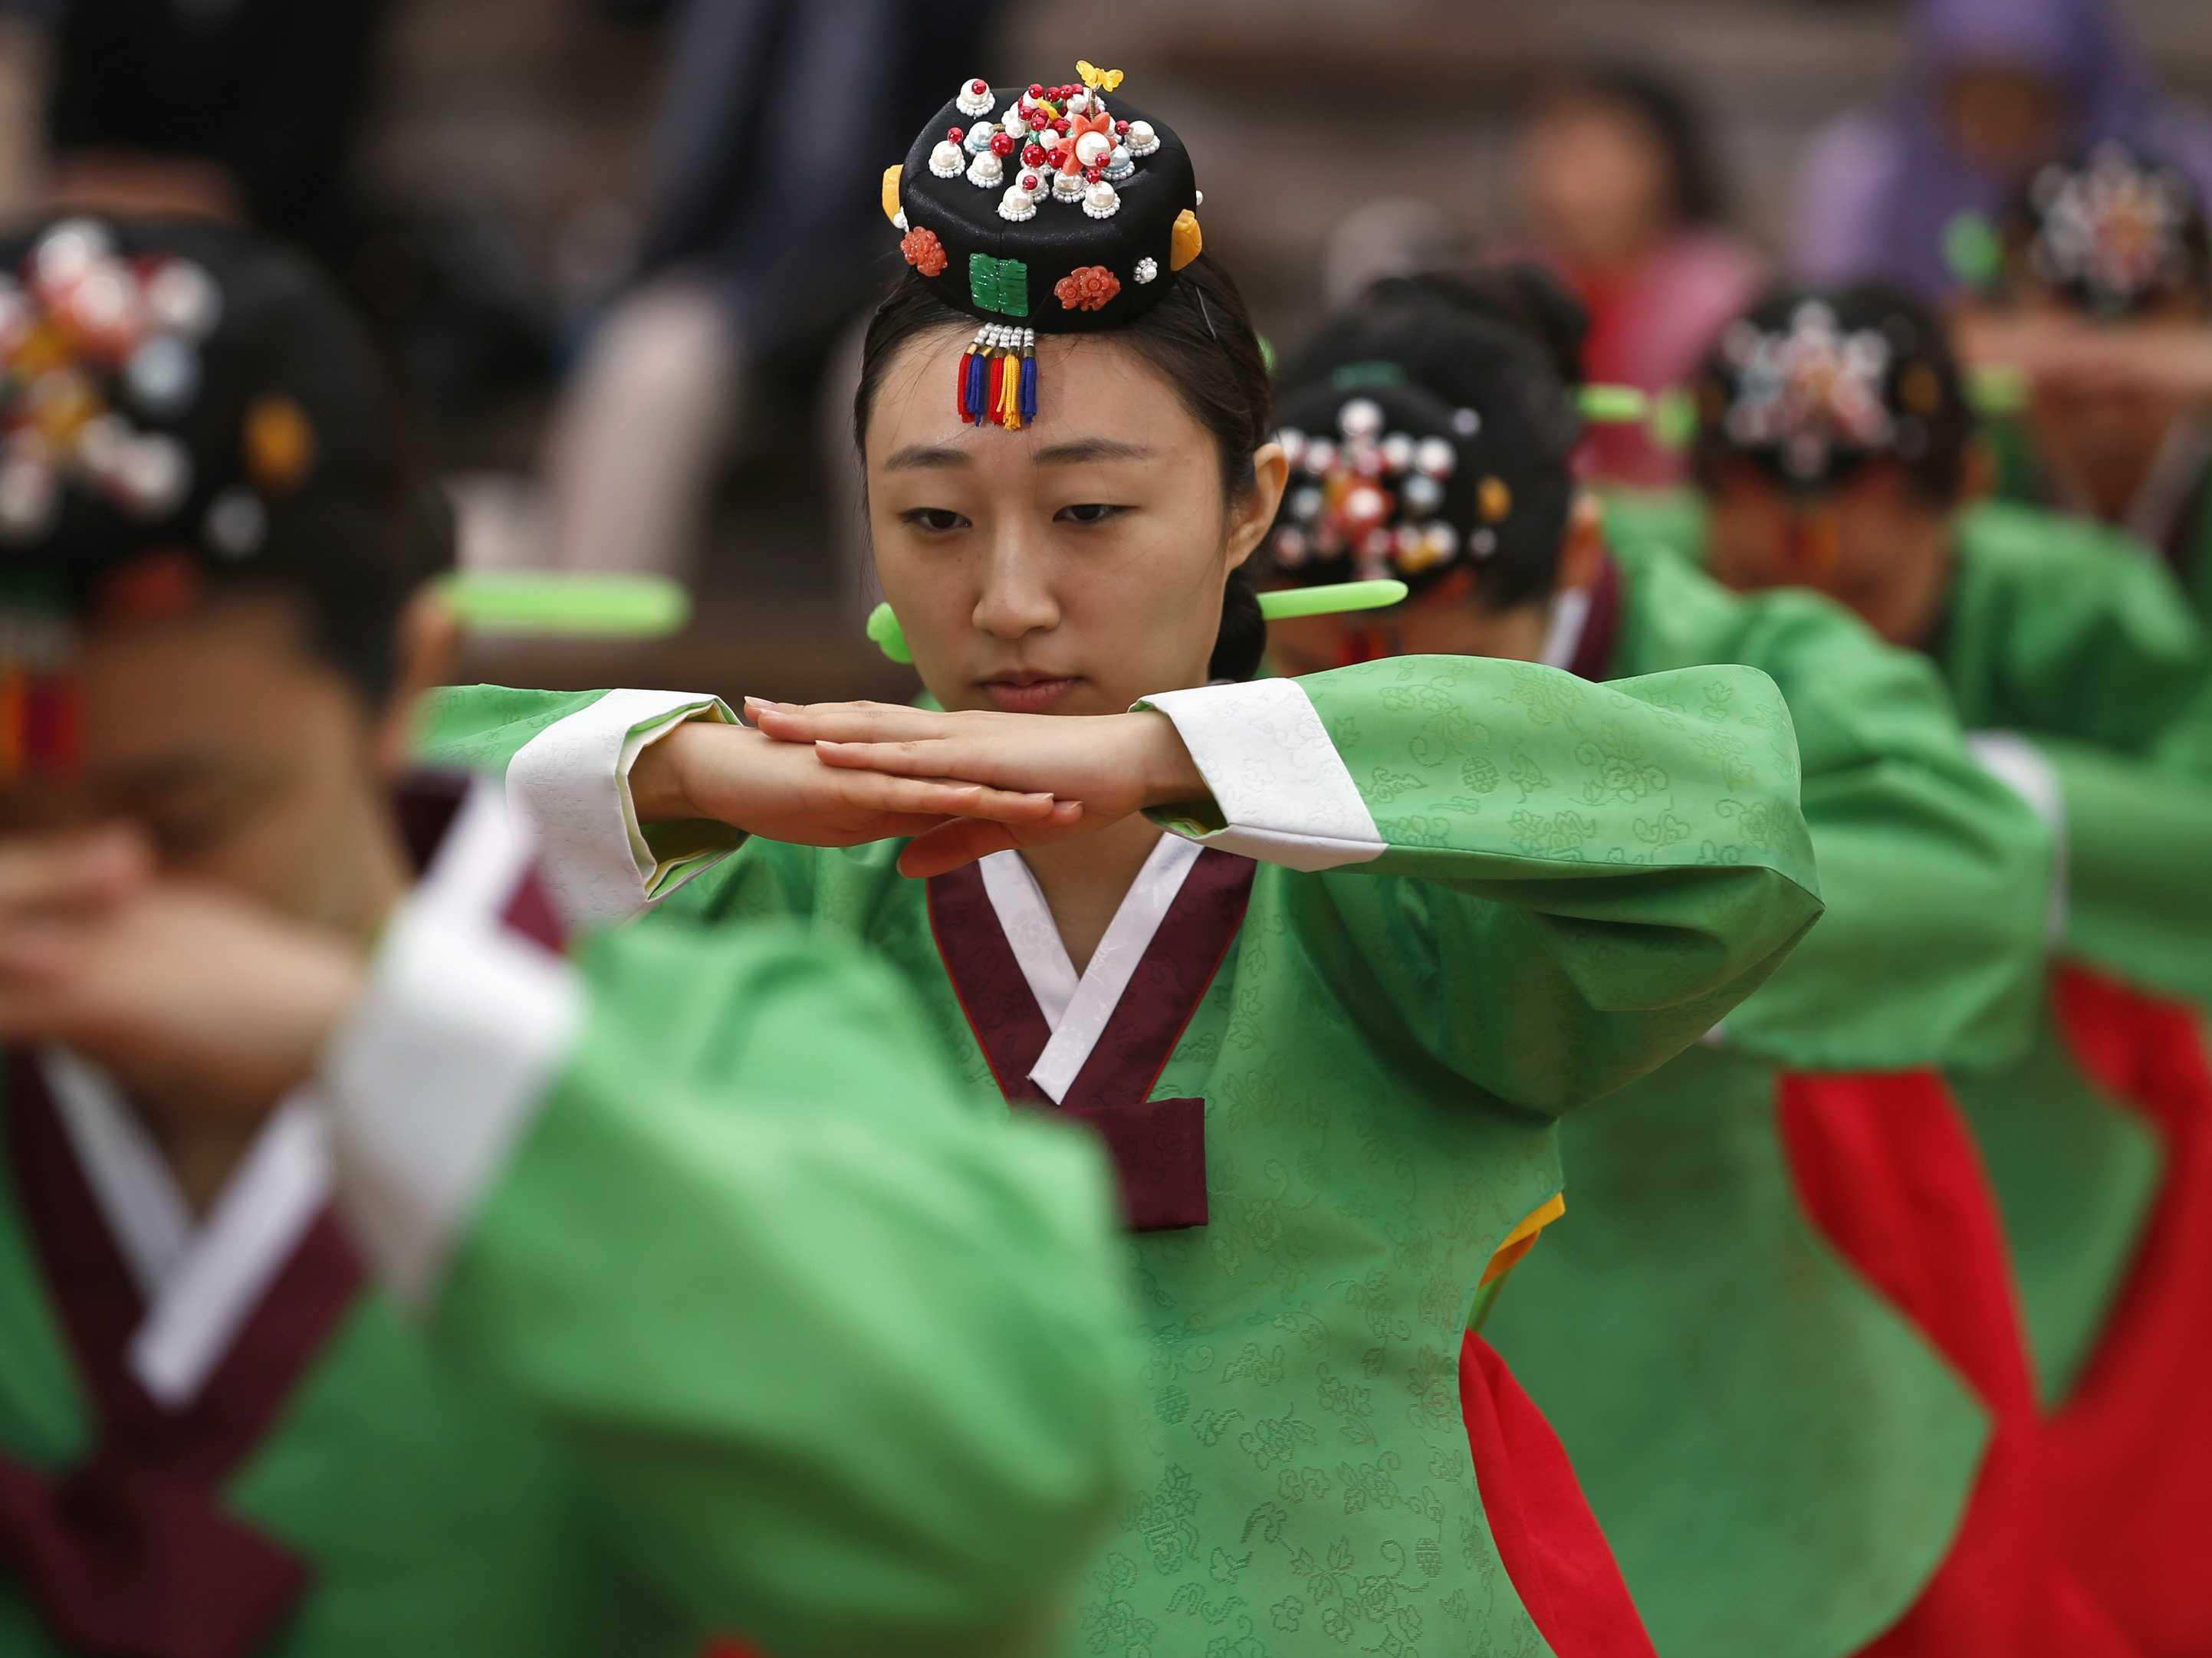 корейцы как нация звонок, маша направилась